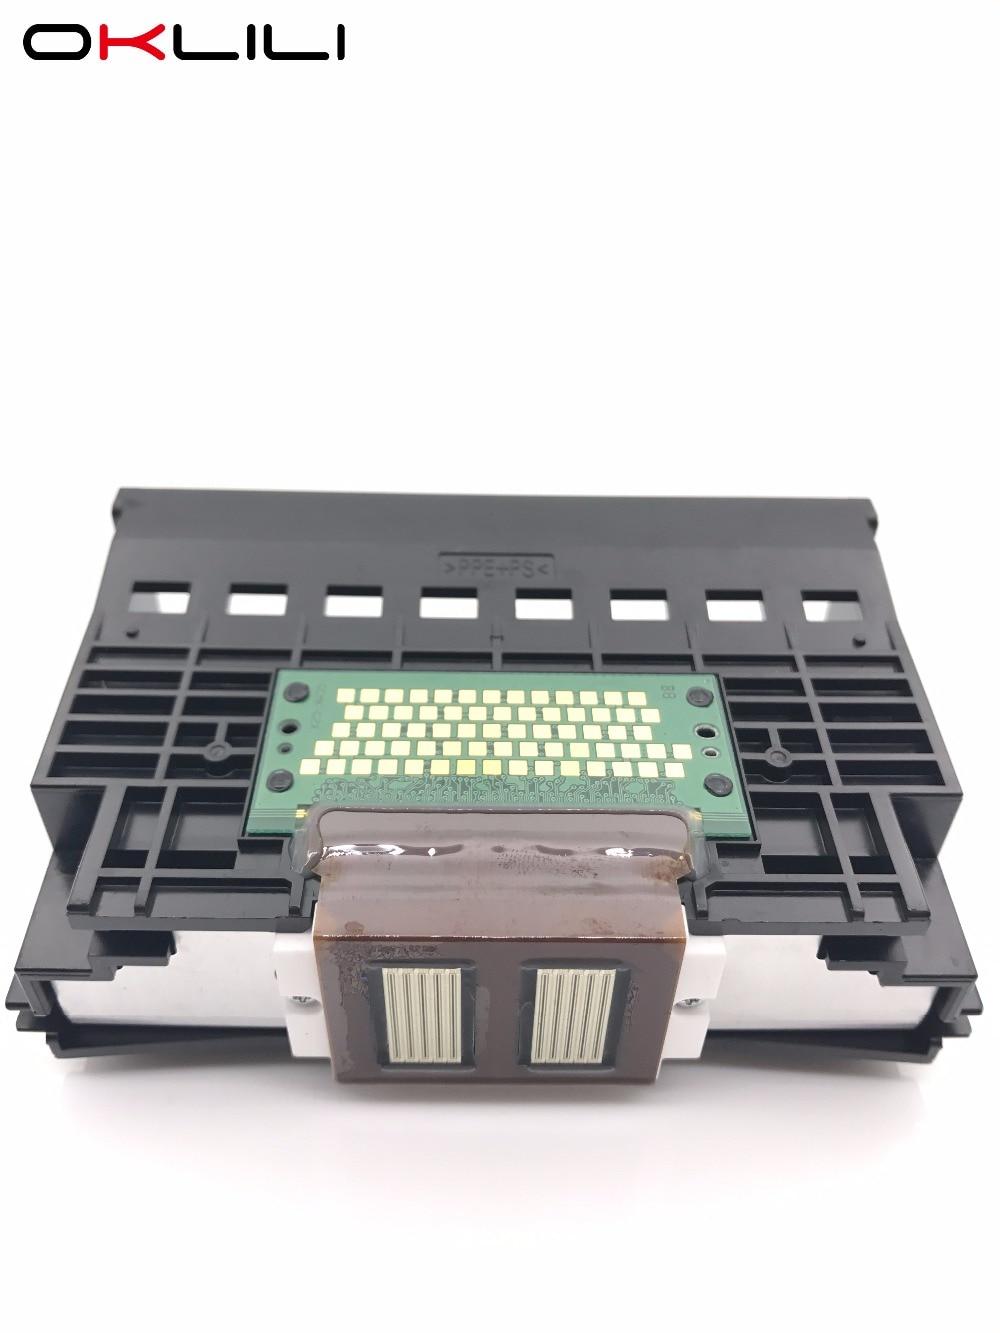 OKLILI ORIGINAL QY6-0055 QY6-0055-000 Printhead Print Head Printer Head for Canon 9900i i9900 i9950 iP8600 iP8500 iP9100 original print head qy6 0056 printhead compatible for canon ds700 ds810 mini220 printer head